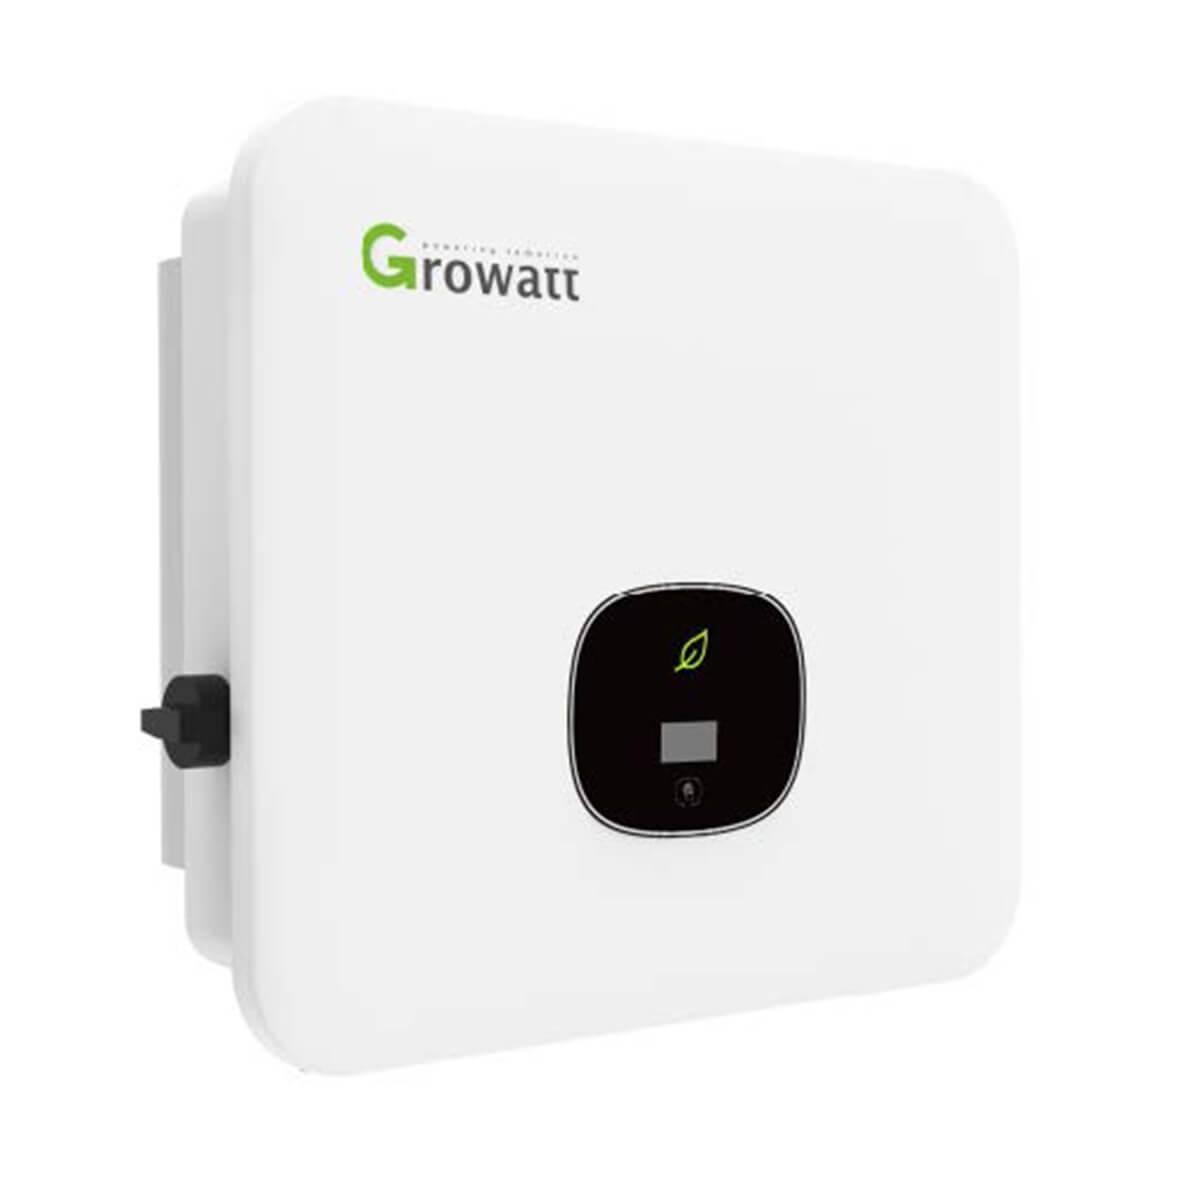 growatt 12kW inverter, growatt mod 12kW inverter, growatt mod 12ktl3-x inverter, growatt mod 12ktl3-x, growatt mod 12 kW, GROWATT 12 KW